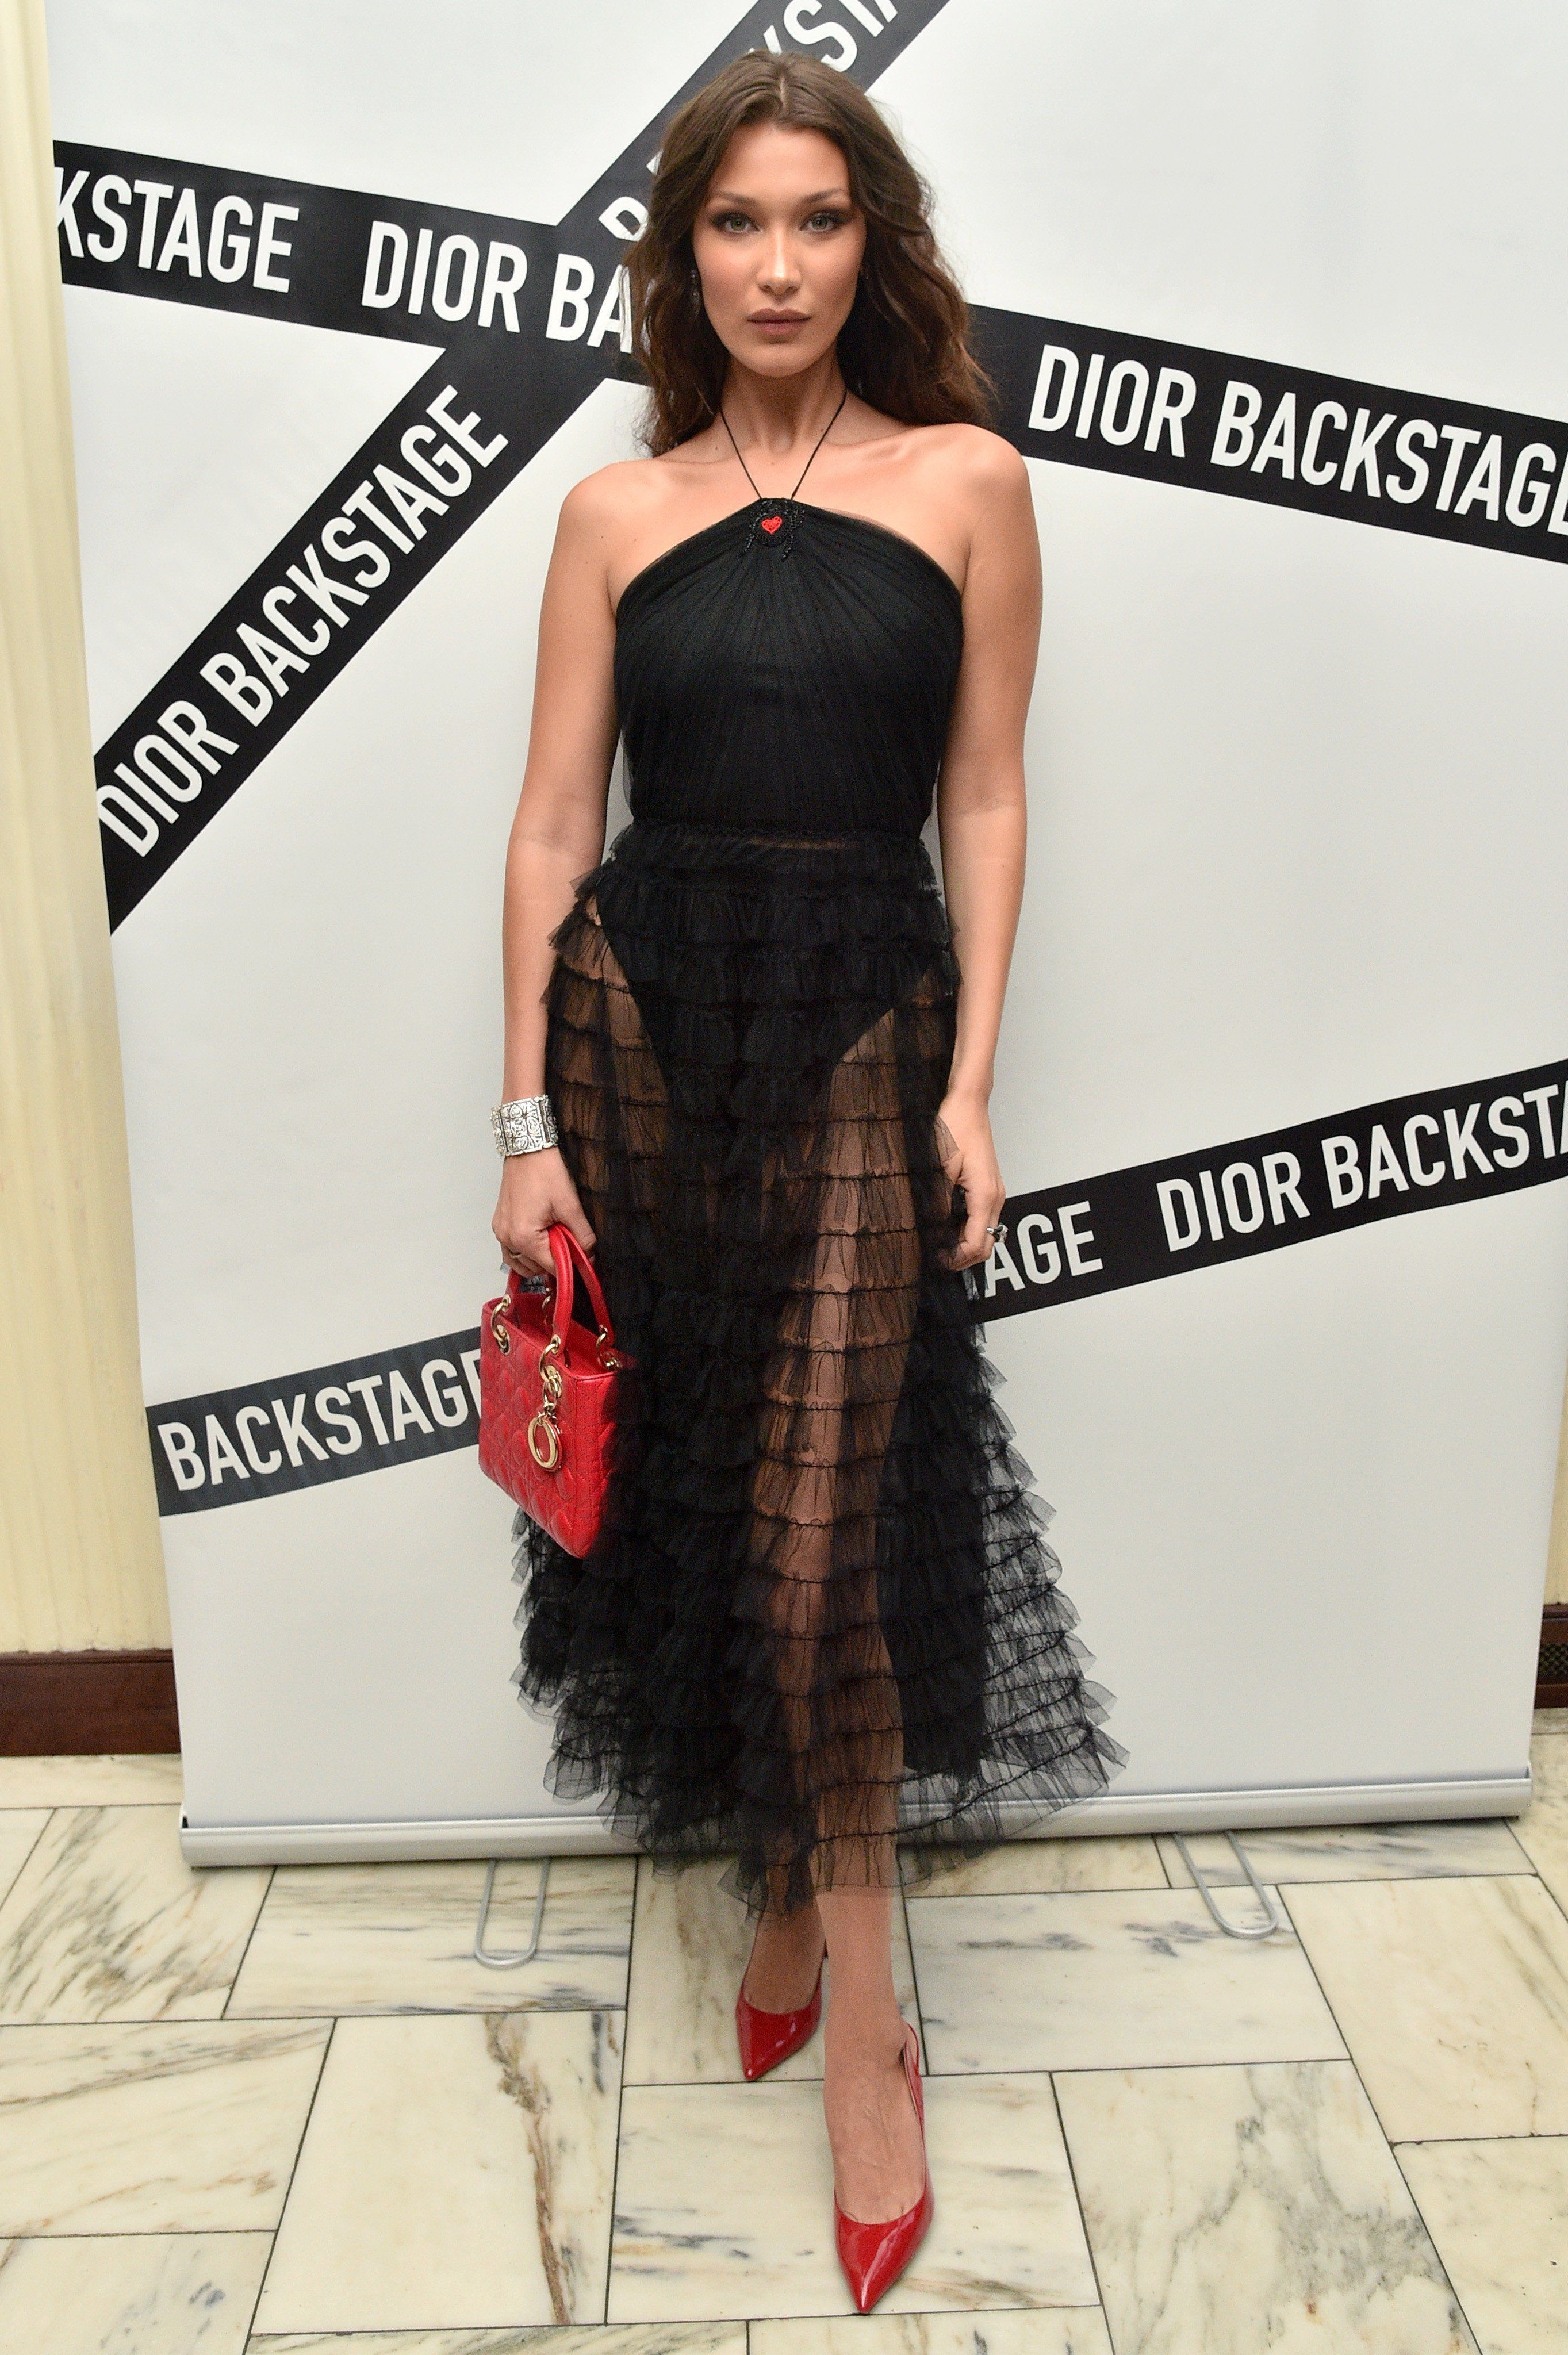 Image Result For Bella Hadid Backstage Dior Fashion